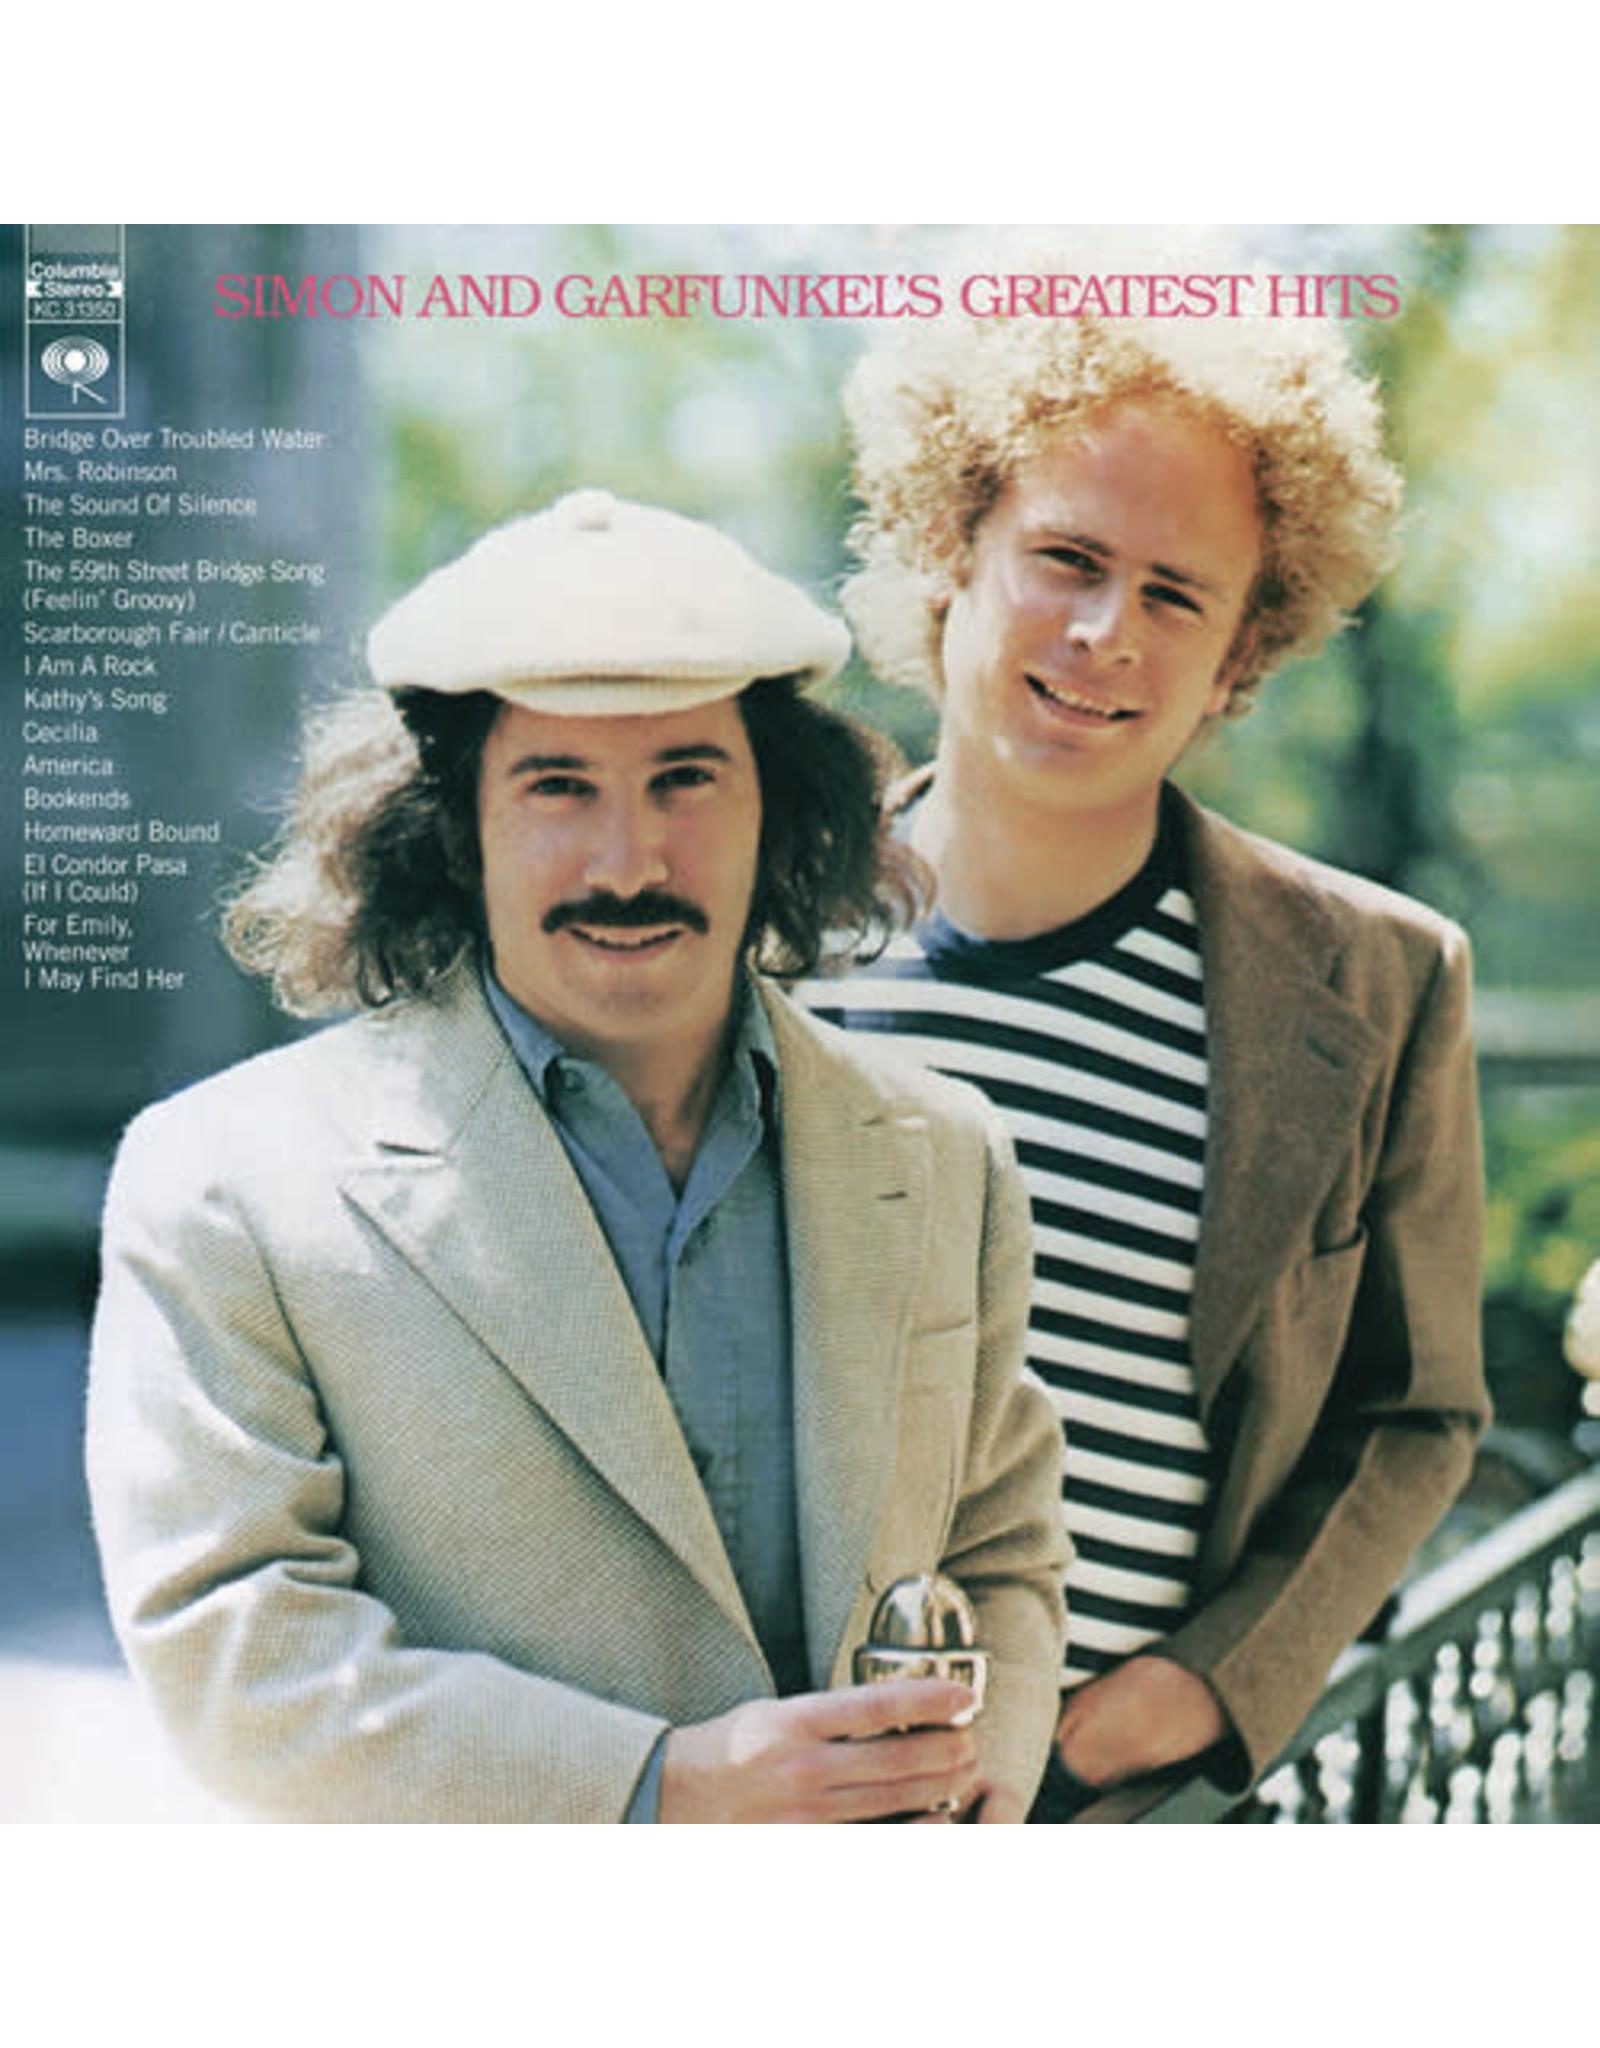 New Vinyl Simon & Garfunkel - Greatest Hits LP